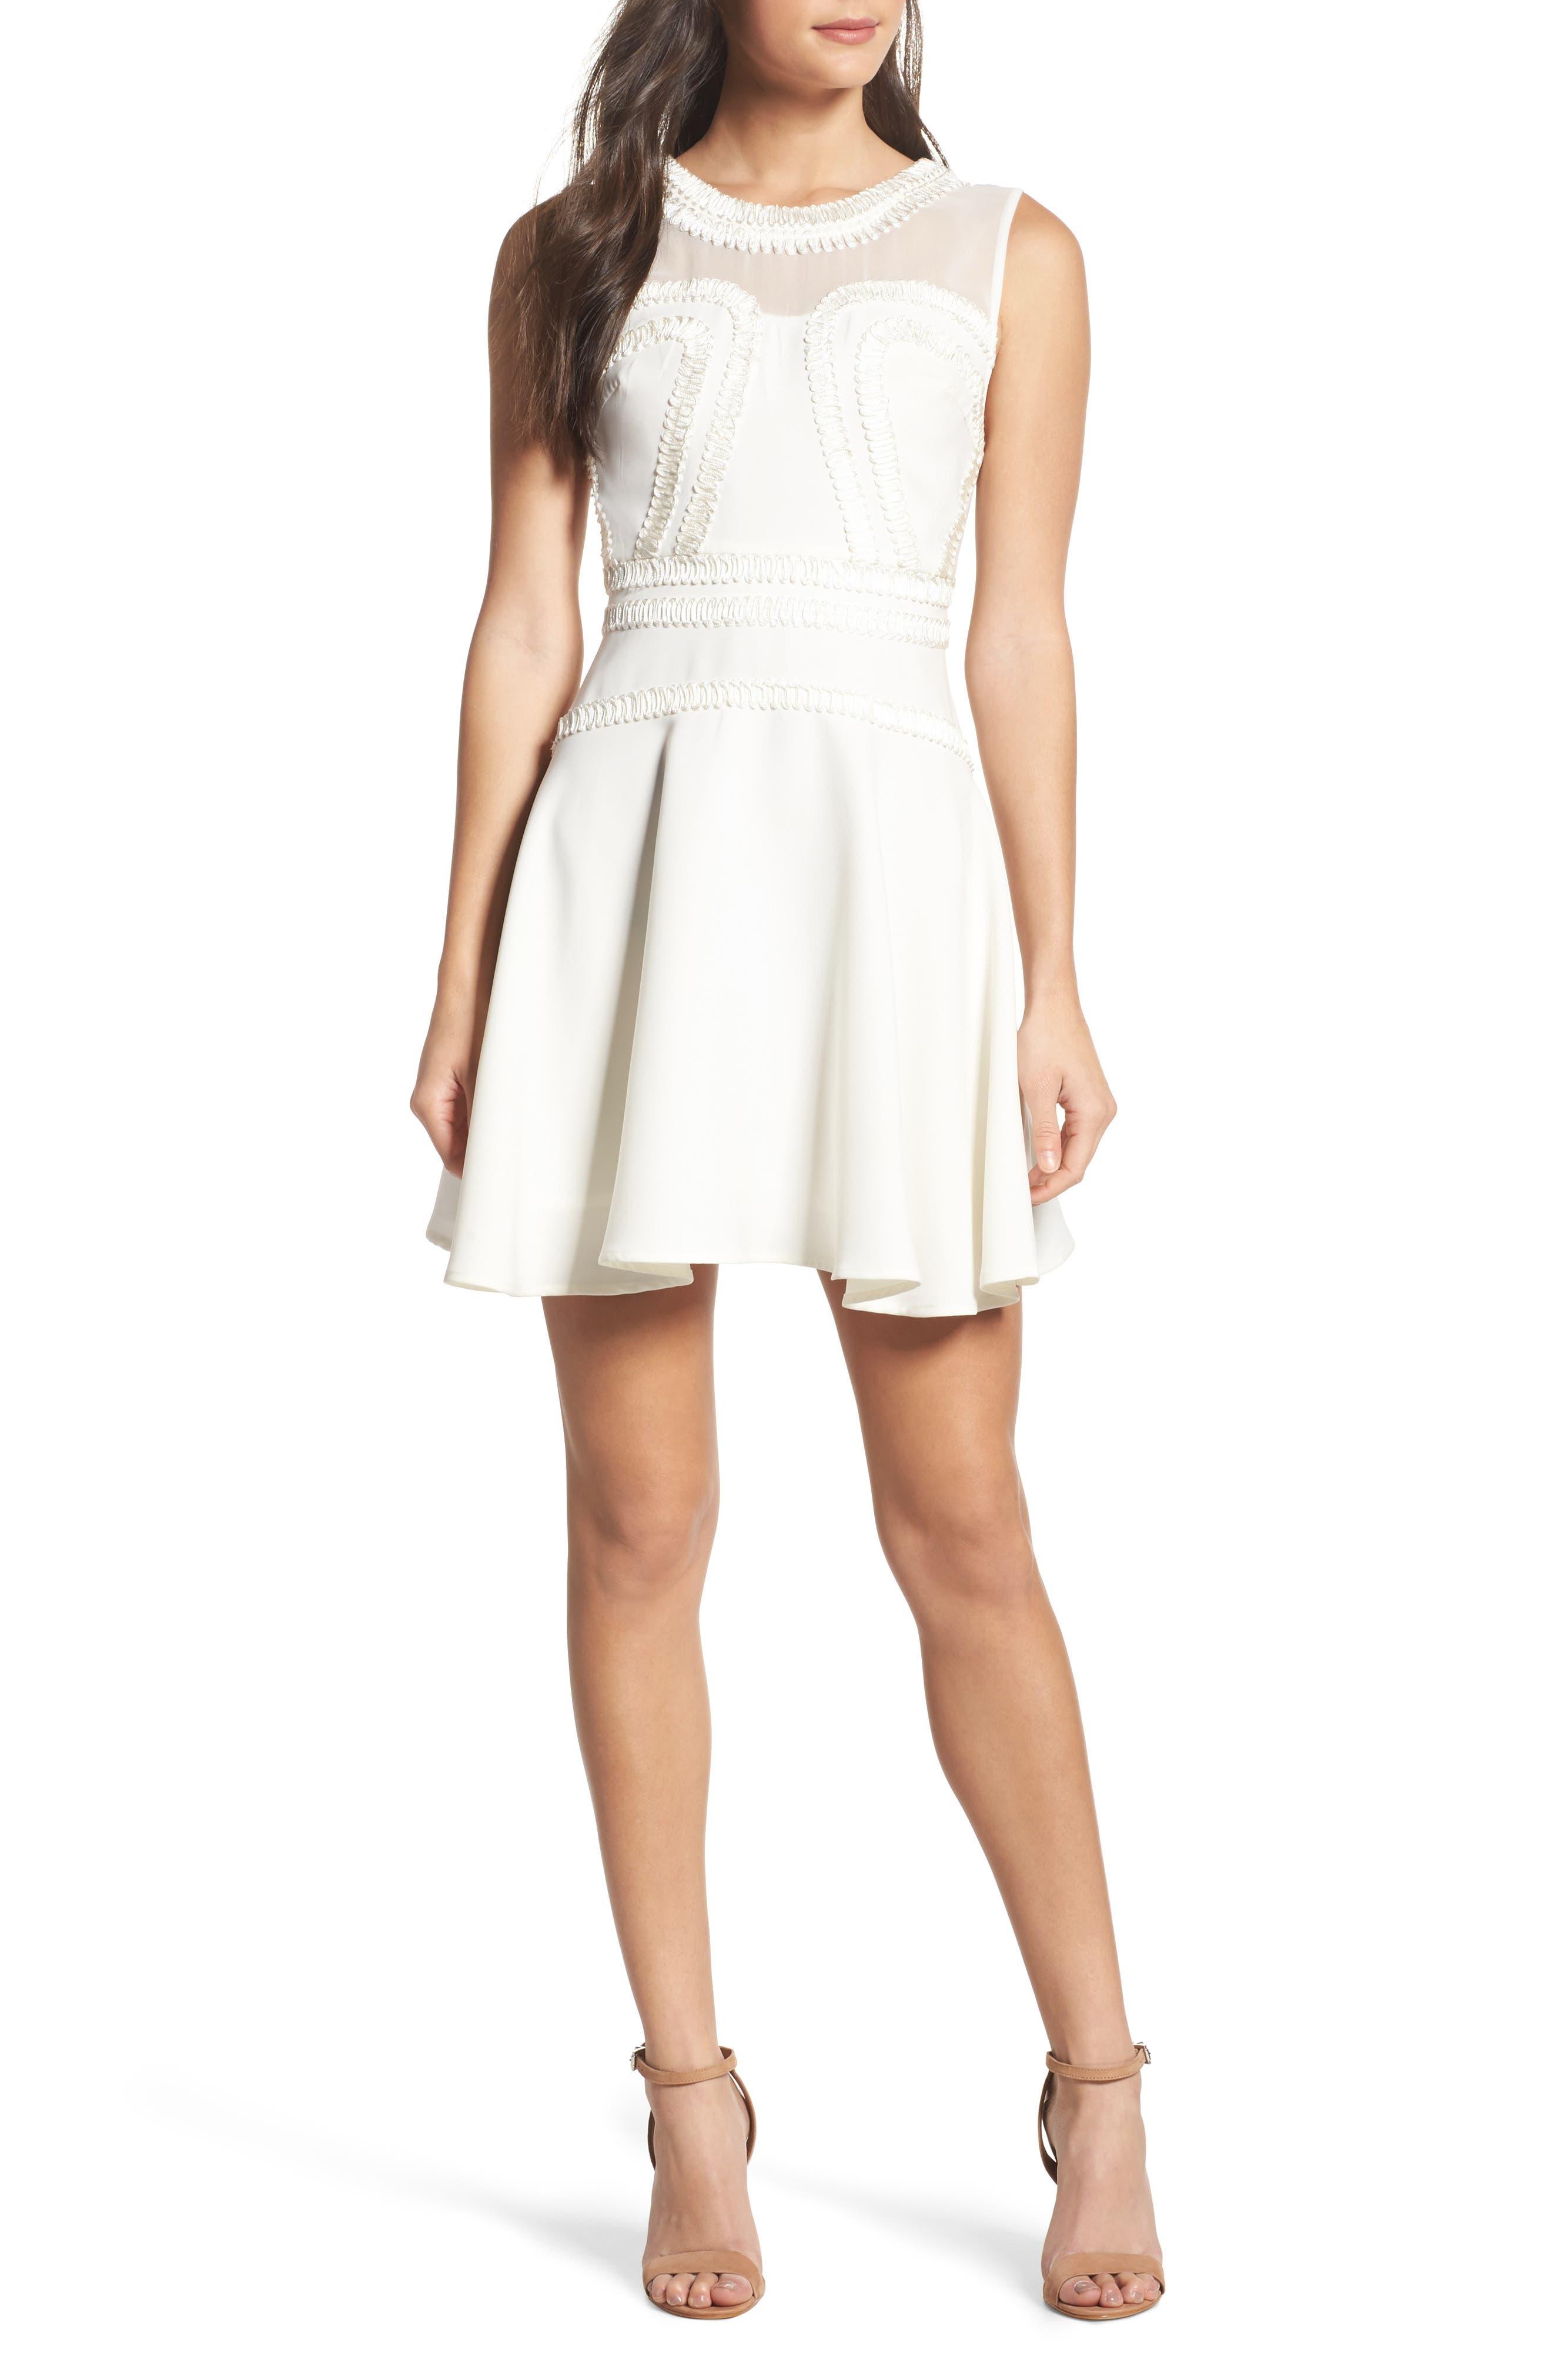 Alternate Image 1 Selected - Foxiedox Aviana Fit & Flare Dress